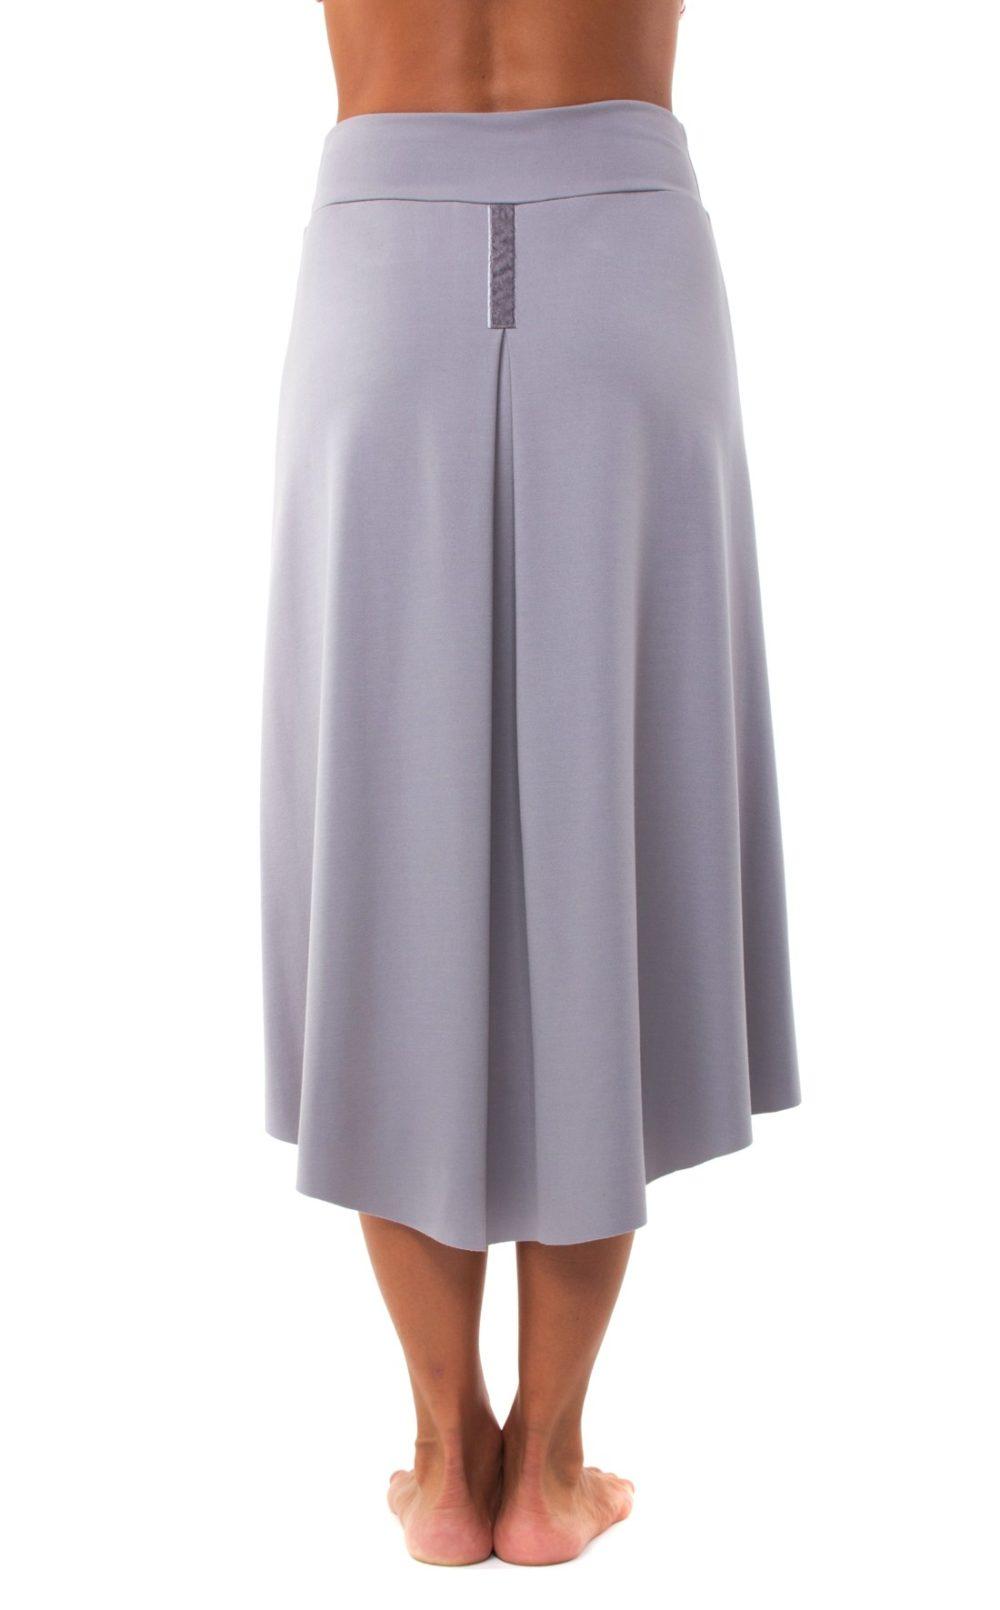 Platyna Lola Tail skirt 3